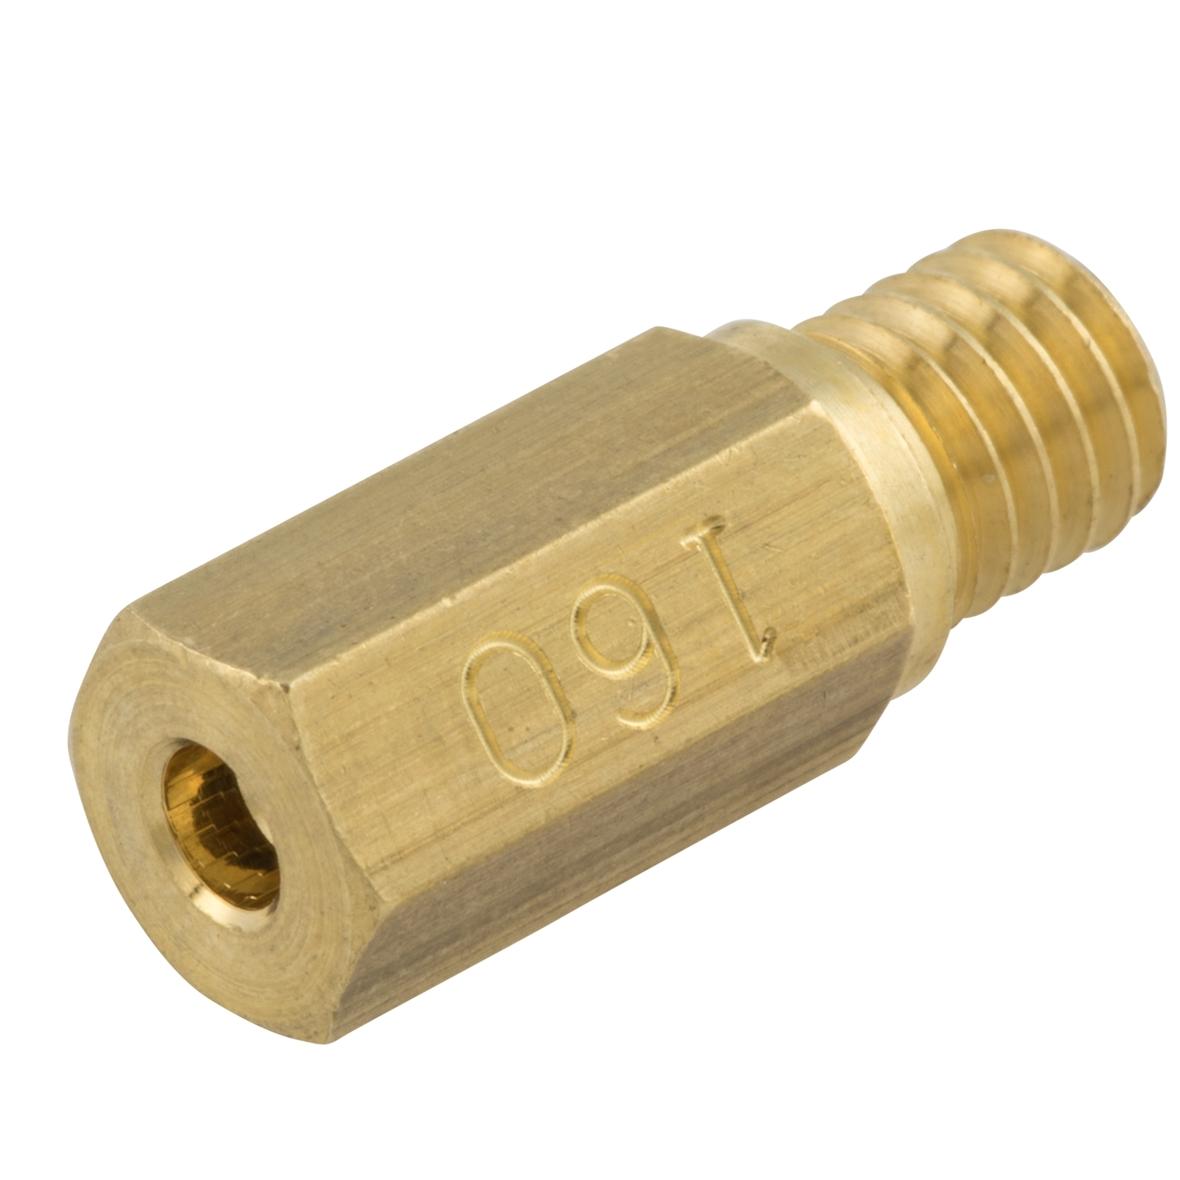 Zdjęcie produktu dla 'Dysza KMT 152 Ø 6 mmTitle'